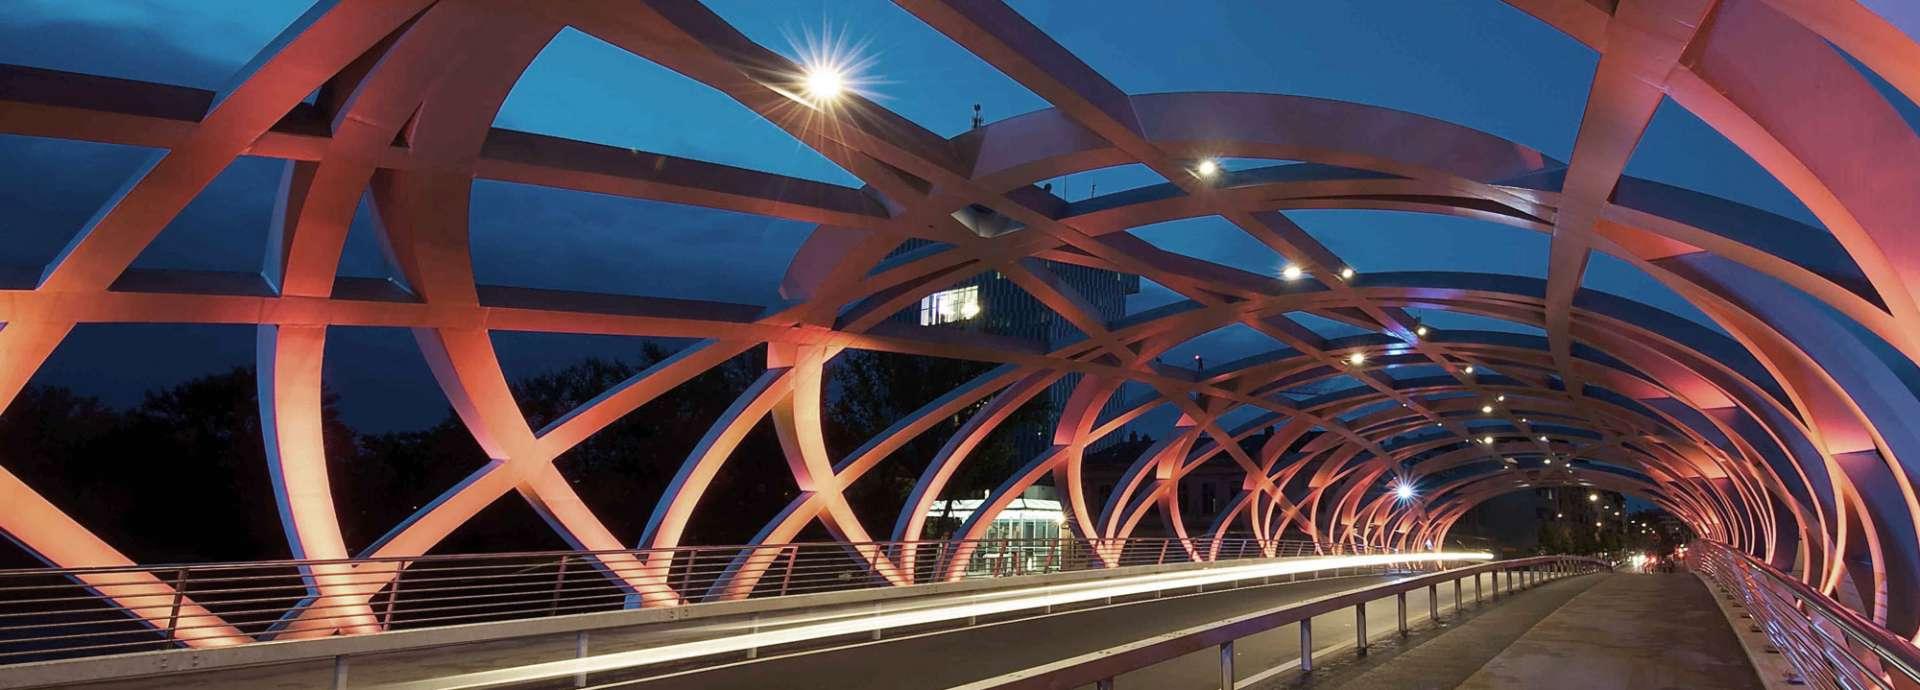 agence-immobiliere-blog-moser-vernet-article-pont-hans-wilsdorf-geneve-1